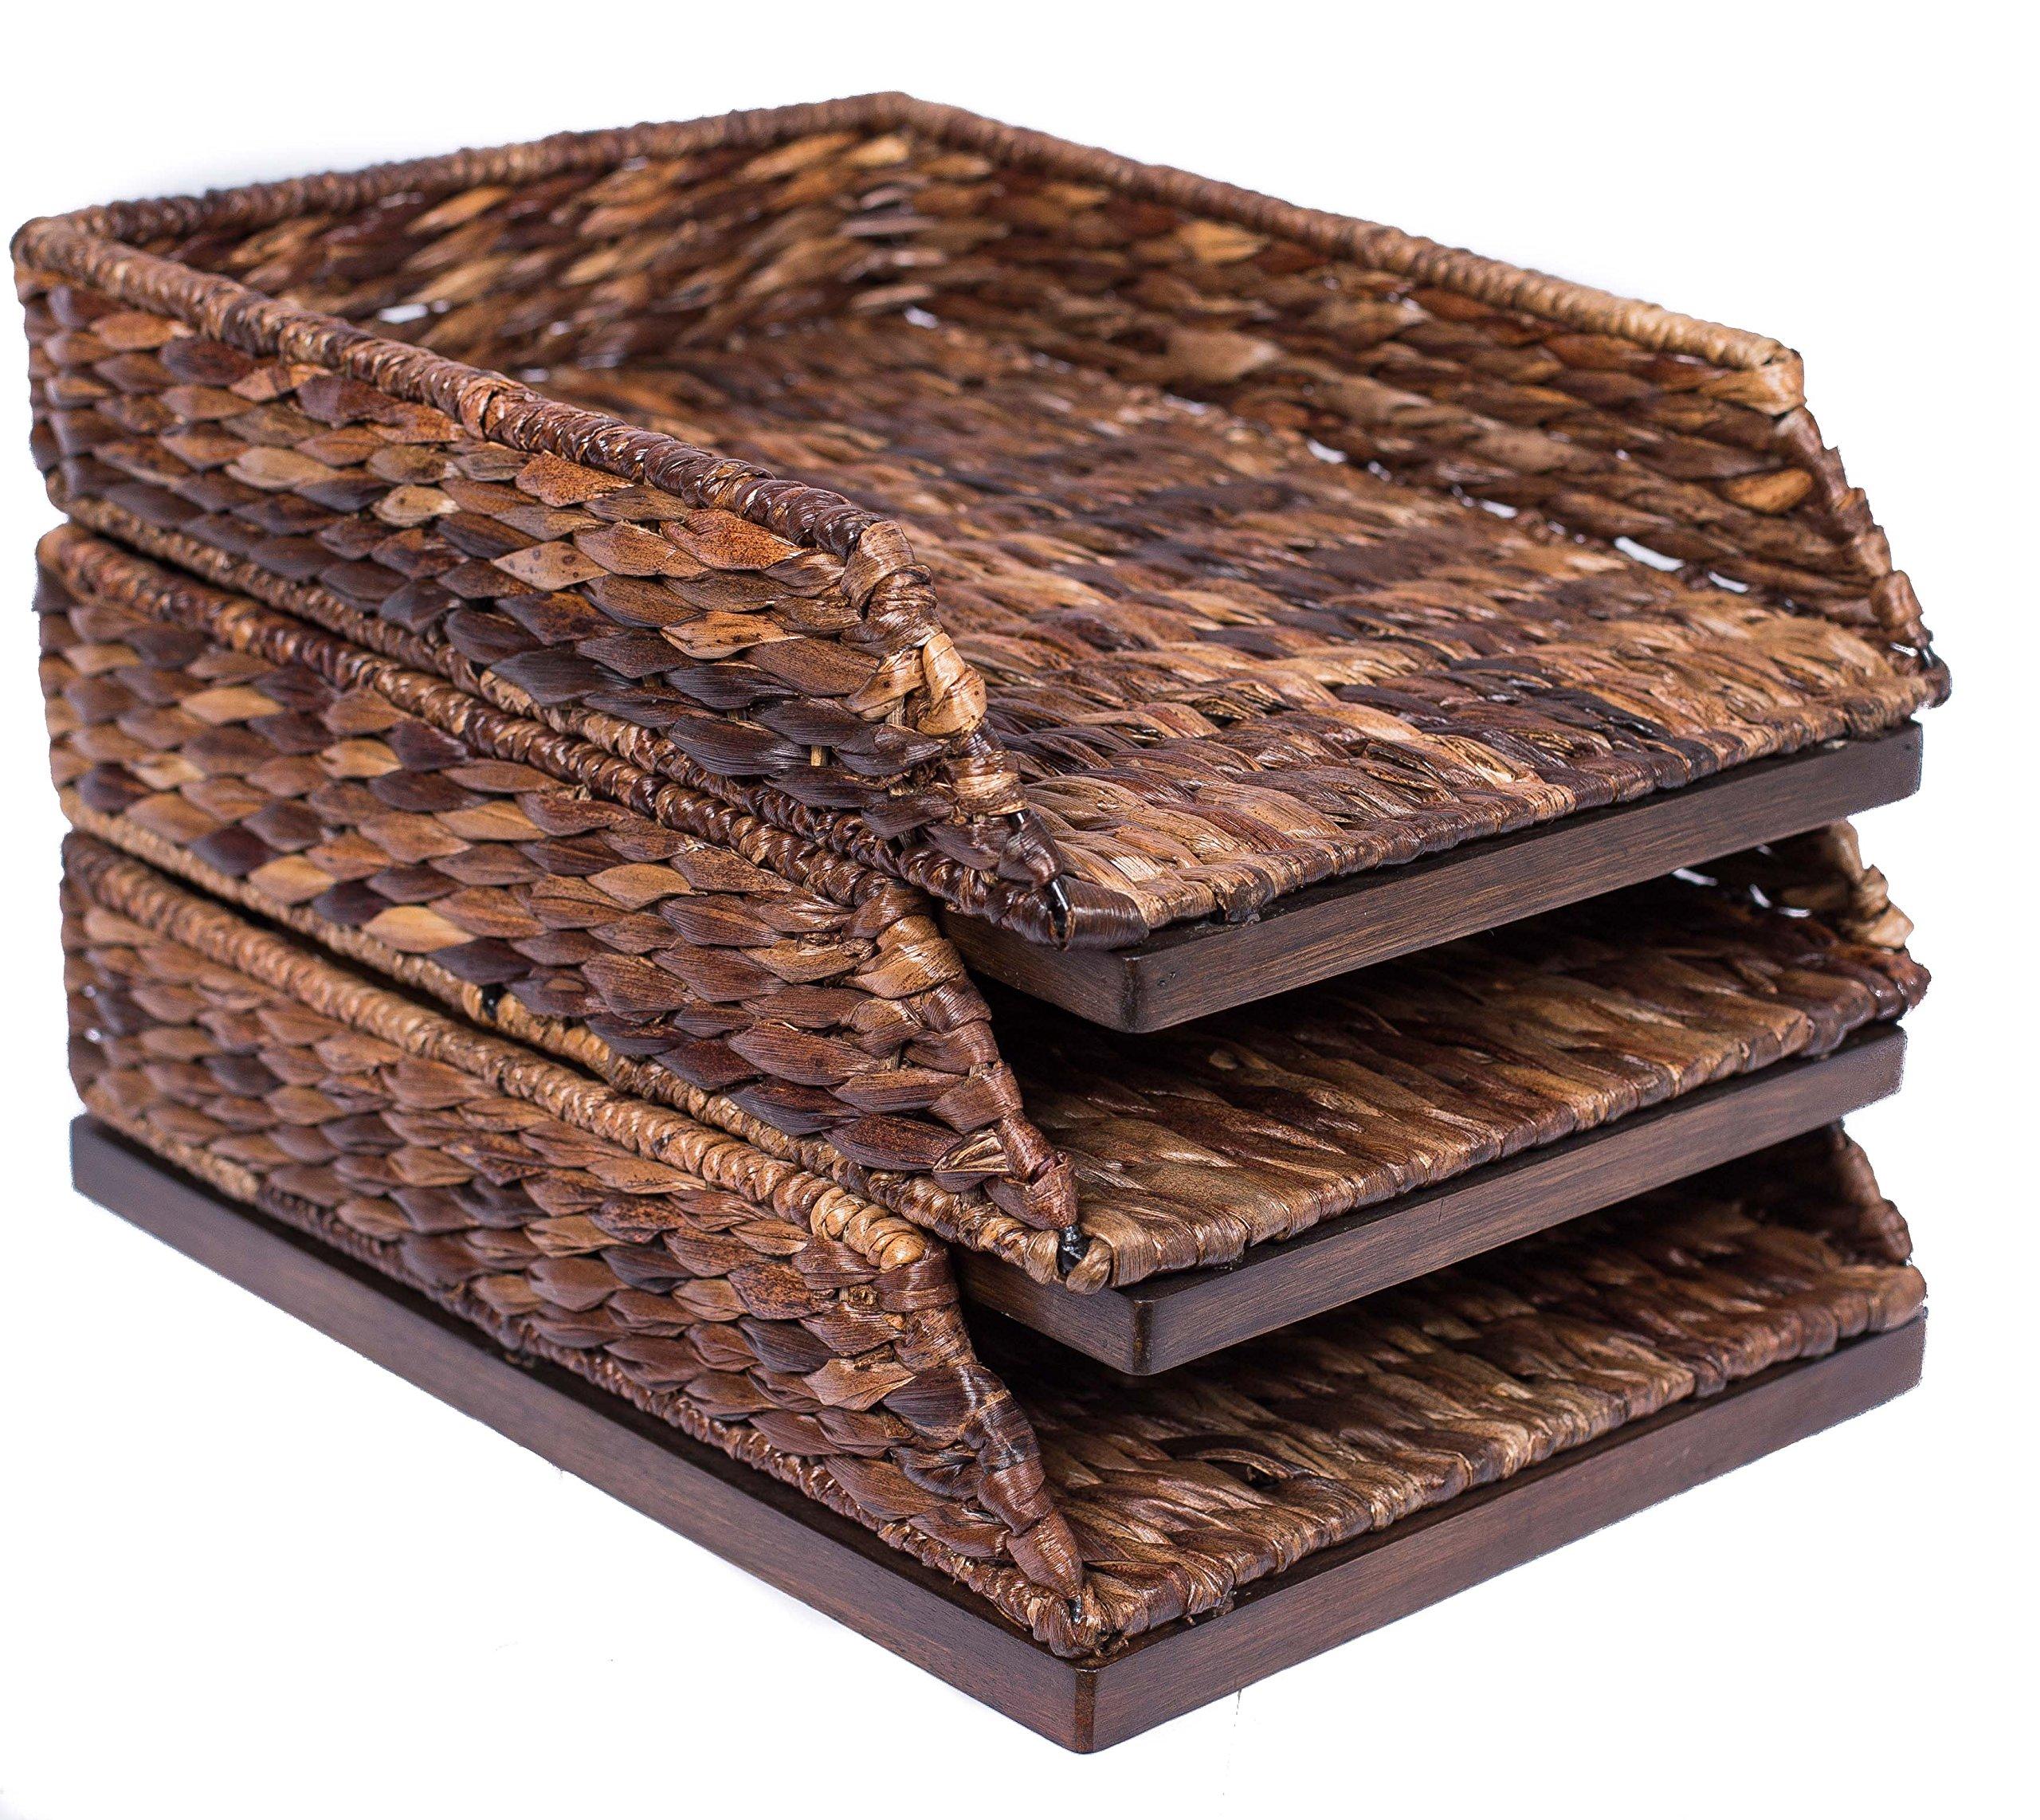 BirdRock Home Seagrass Paper Tray | Hand Woven | Set of 3 | Desk Organizer | Stackable Paper Holder | Dark Natural | Stylish Decorative Design | Filer